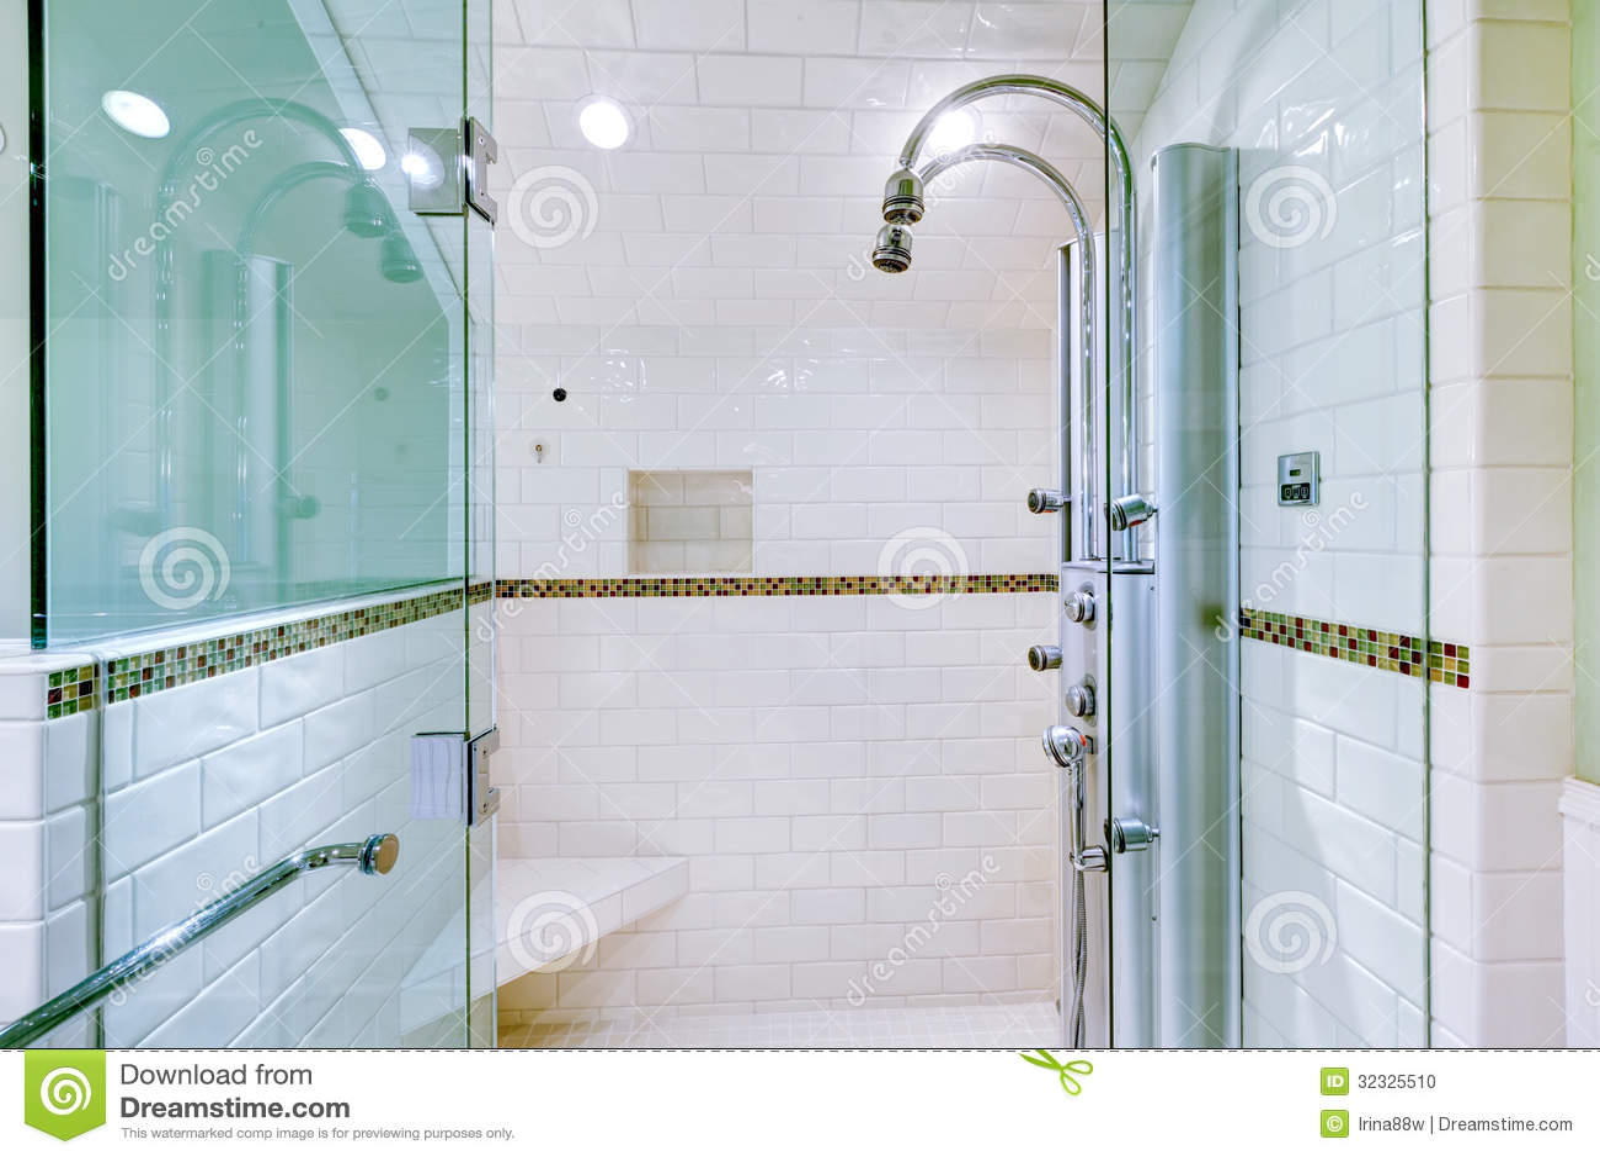 White Large Luxury Bathroom Walk In Shower Stock Photo Image 32325510